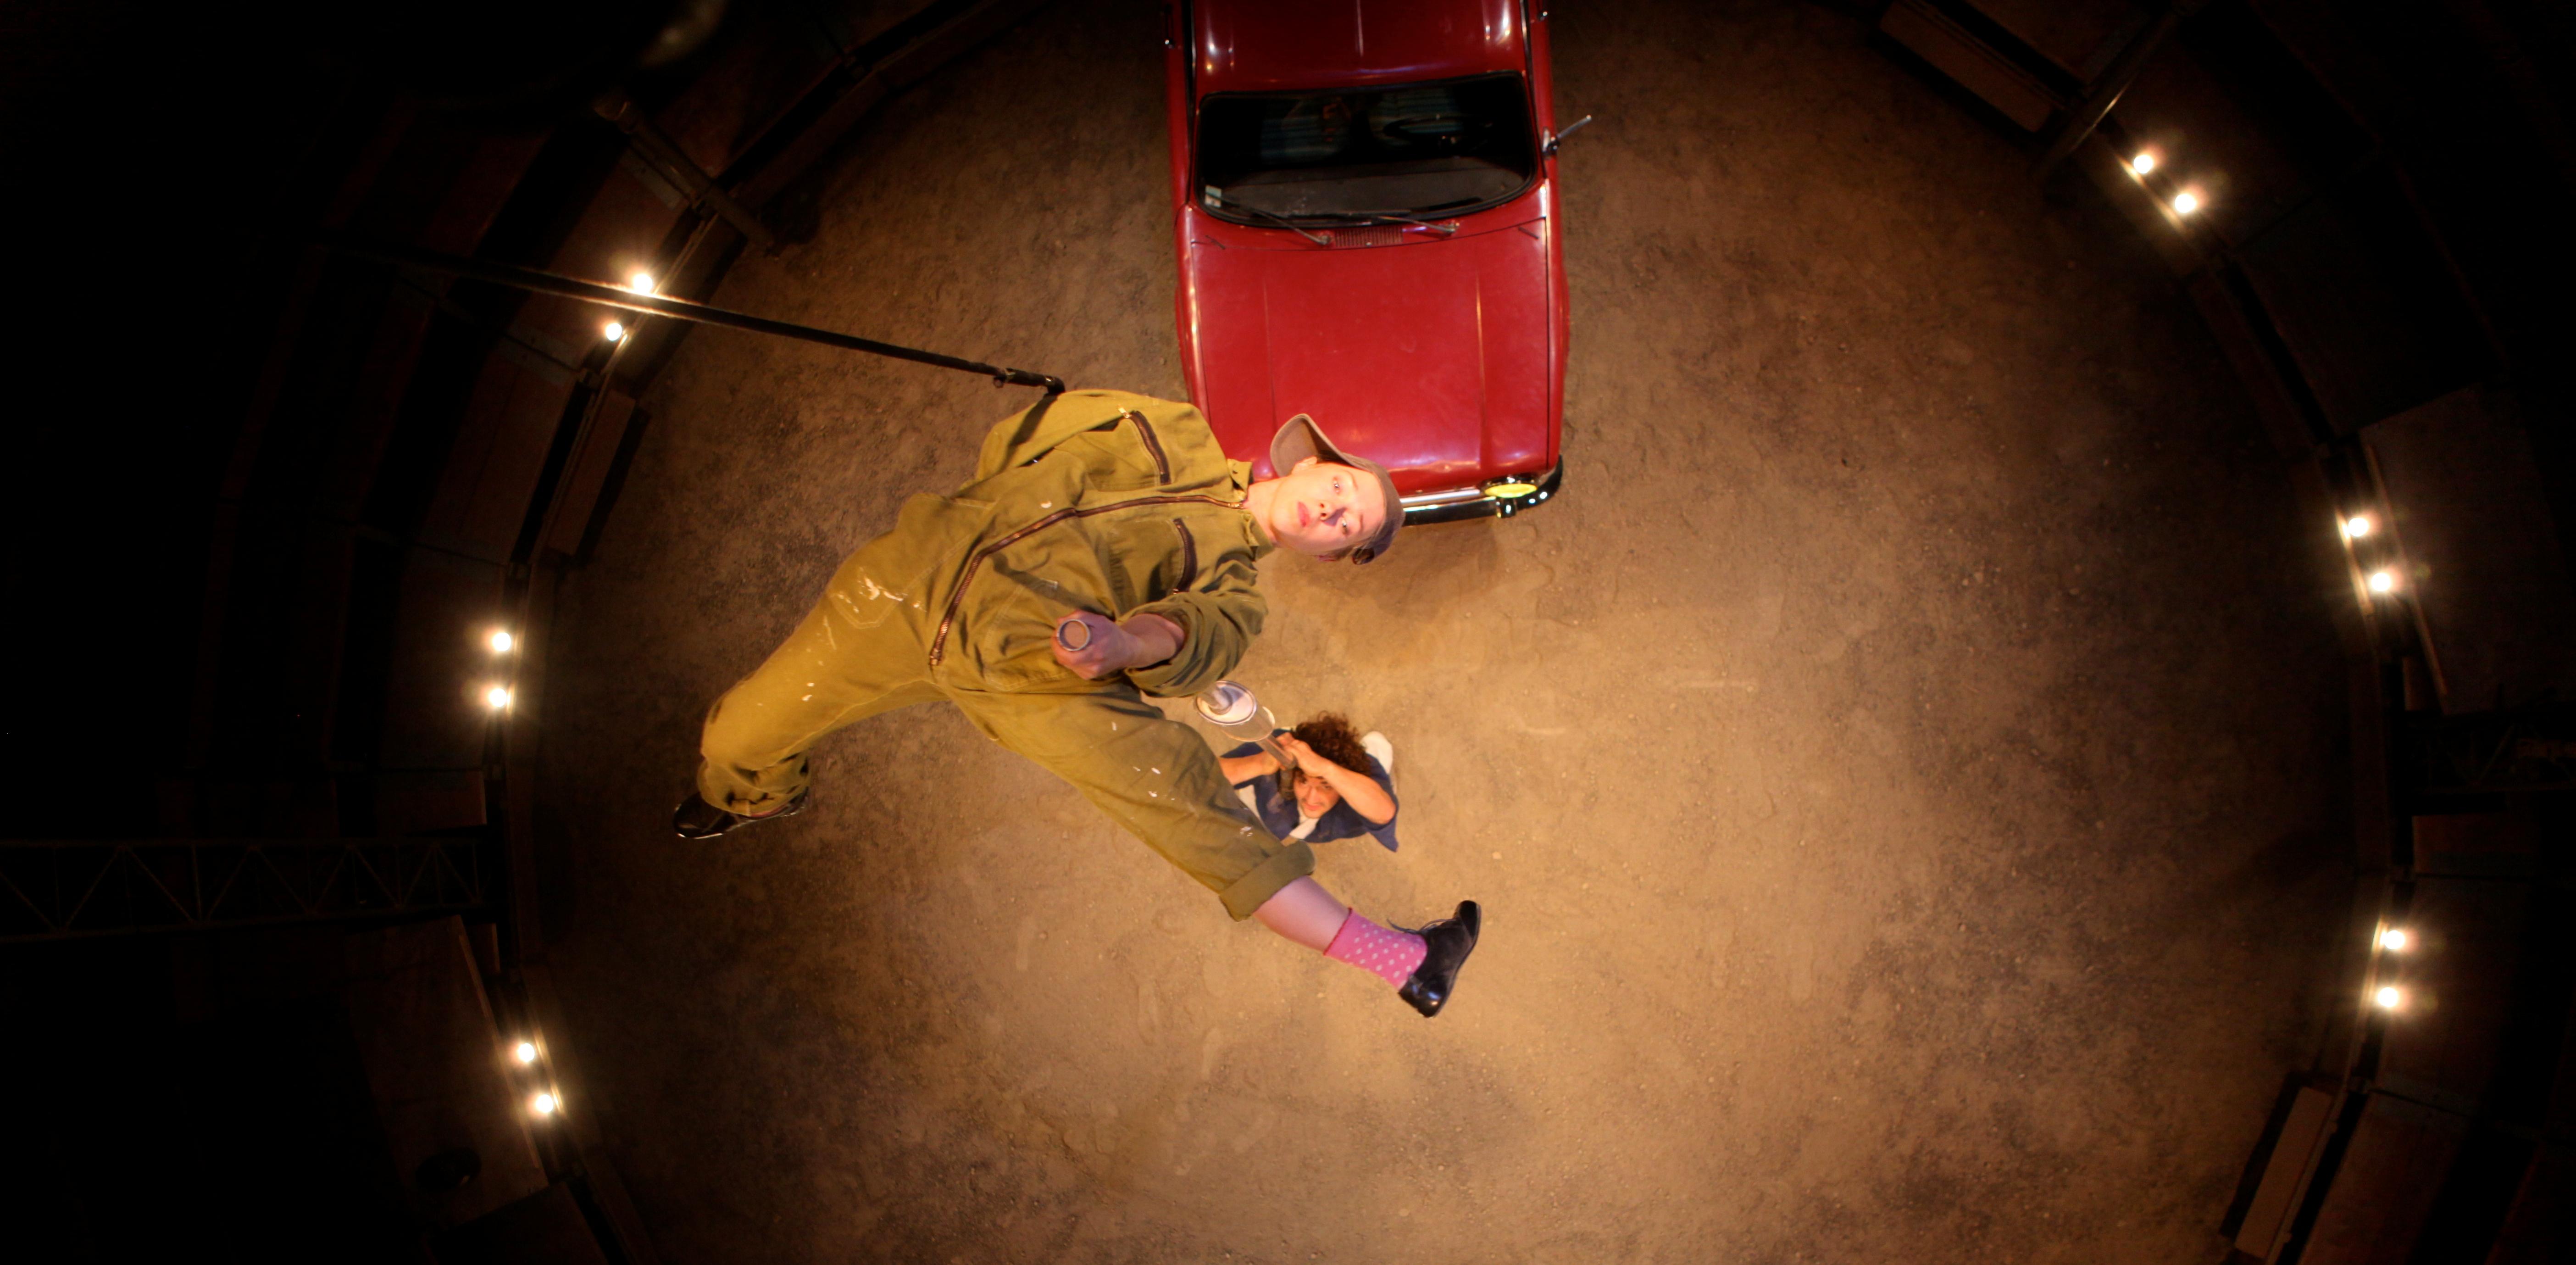 Une Simca 1000, complice artistique du Cirque Aïtal